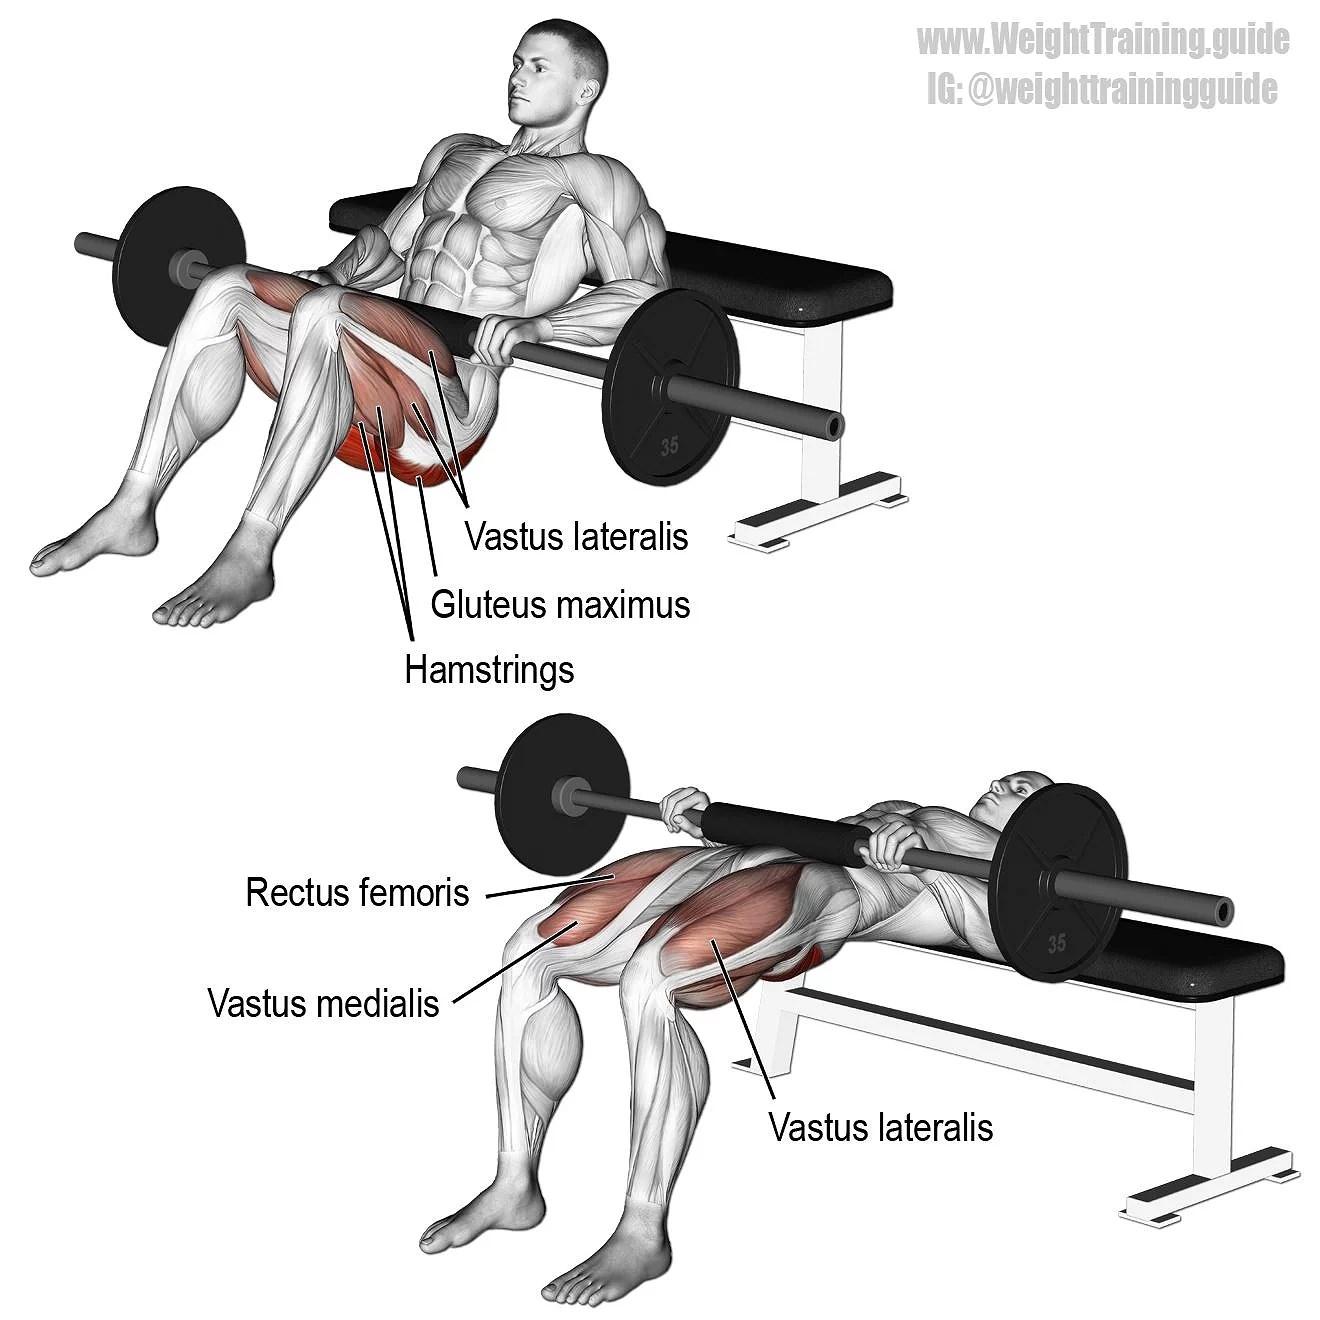 3 fave leg exercises